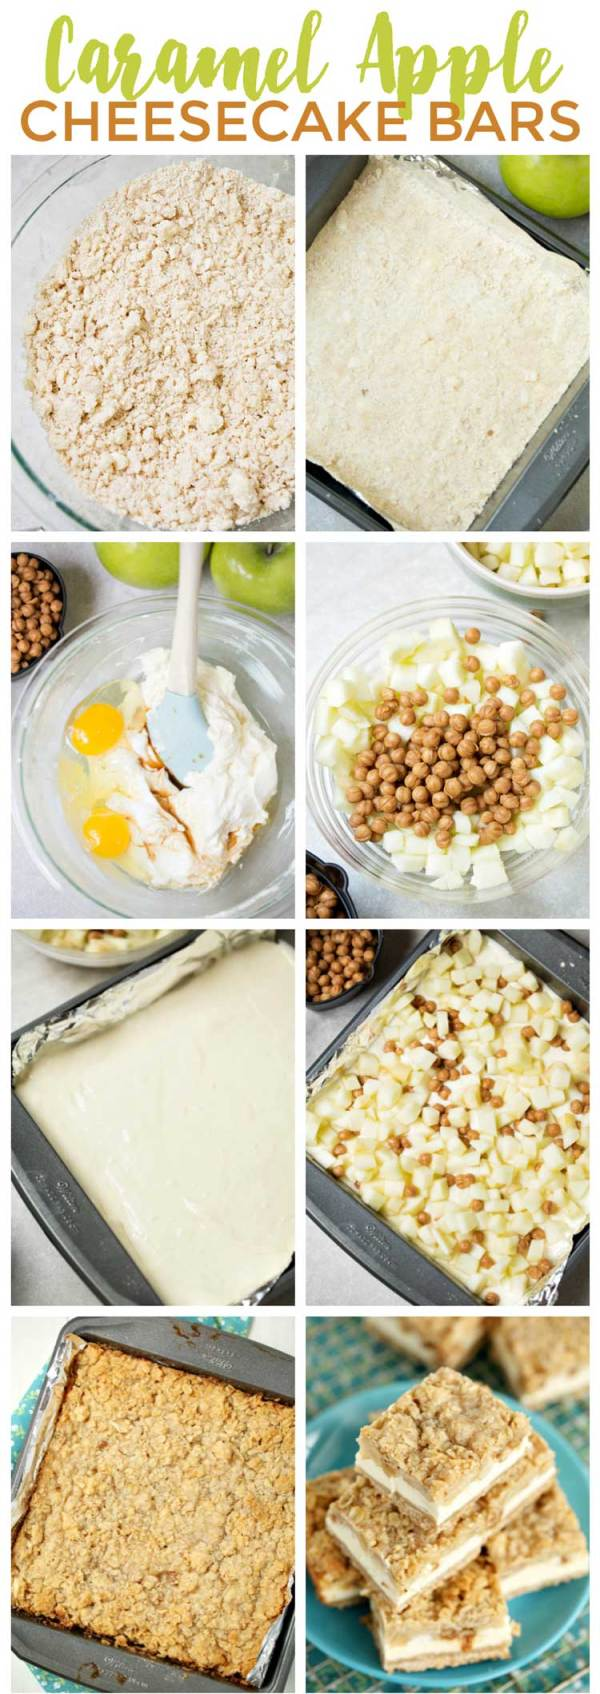 How to Make Caramel Apple Cheesecake Bars